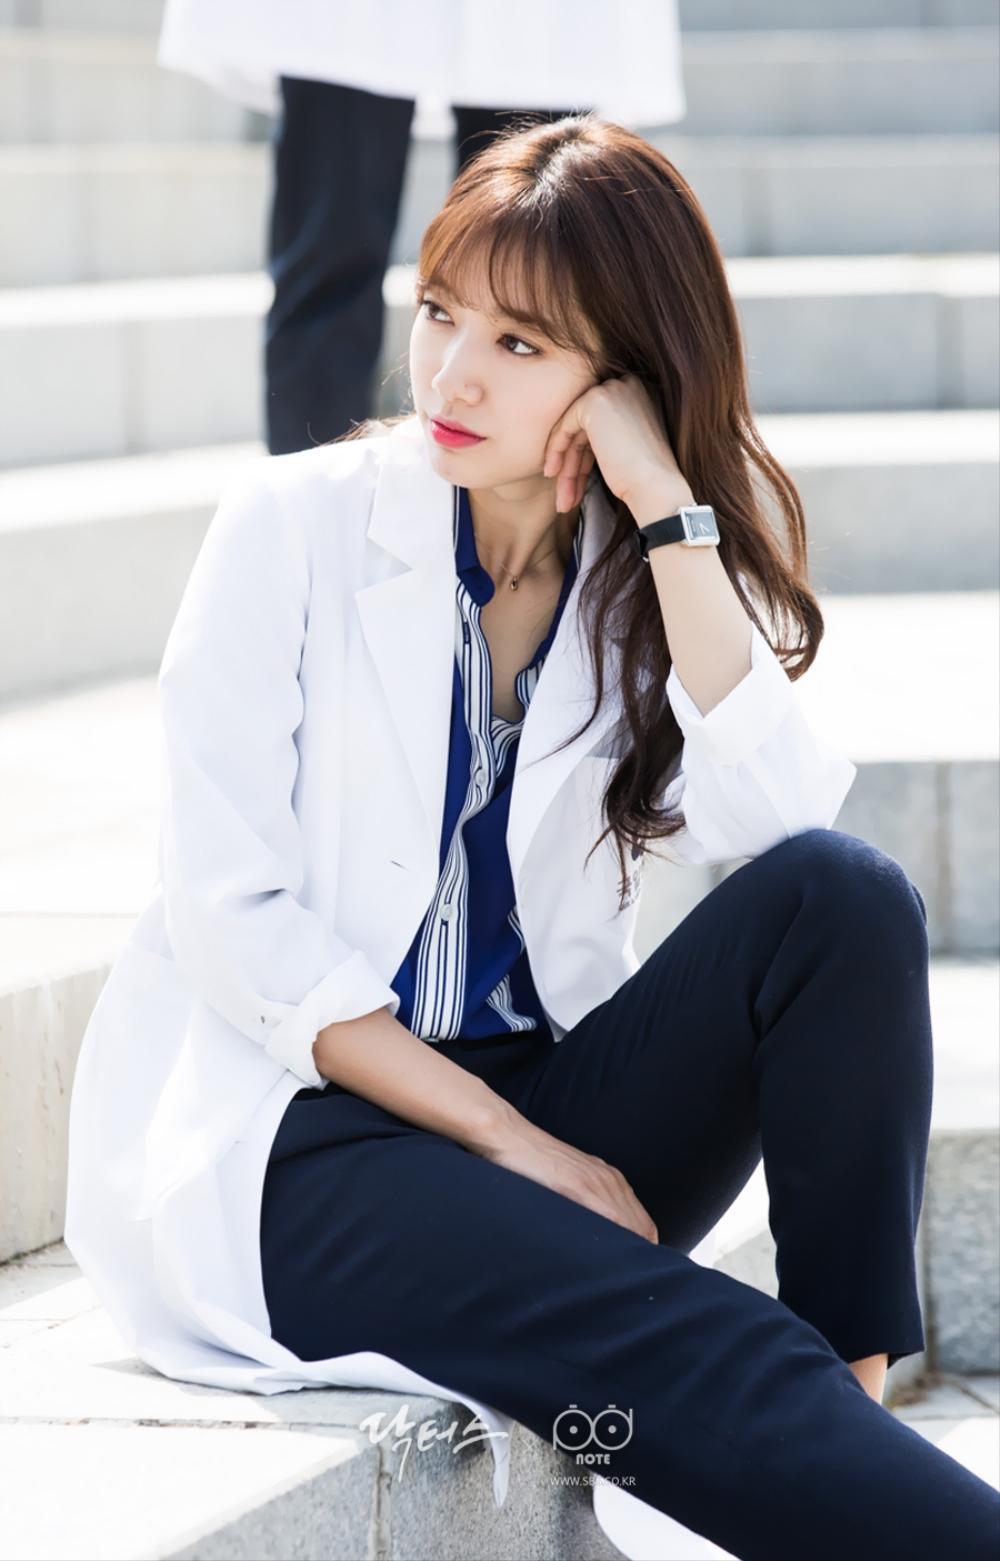 Park Shin Hye Doctors Hair 32692 Applestory